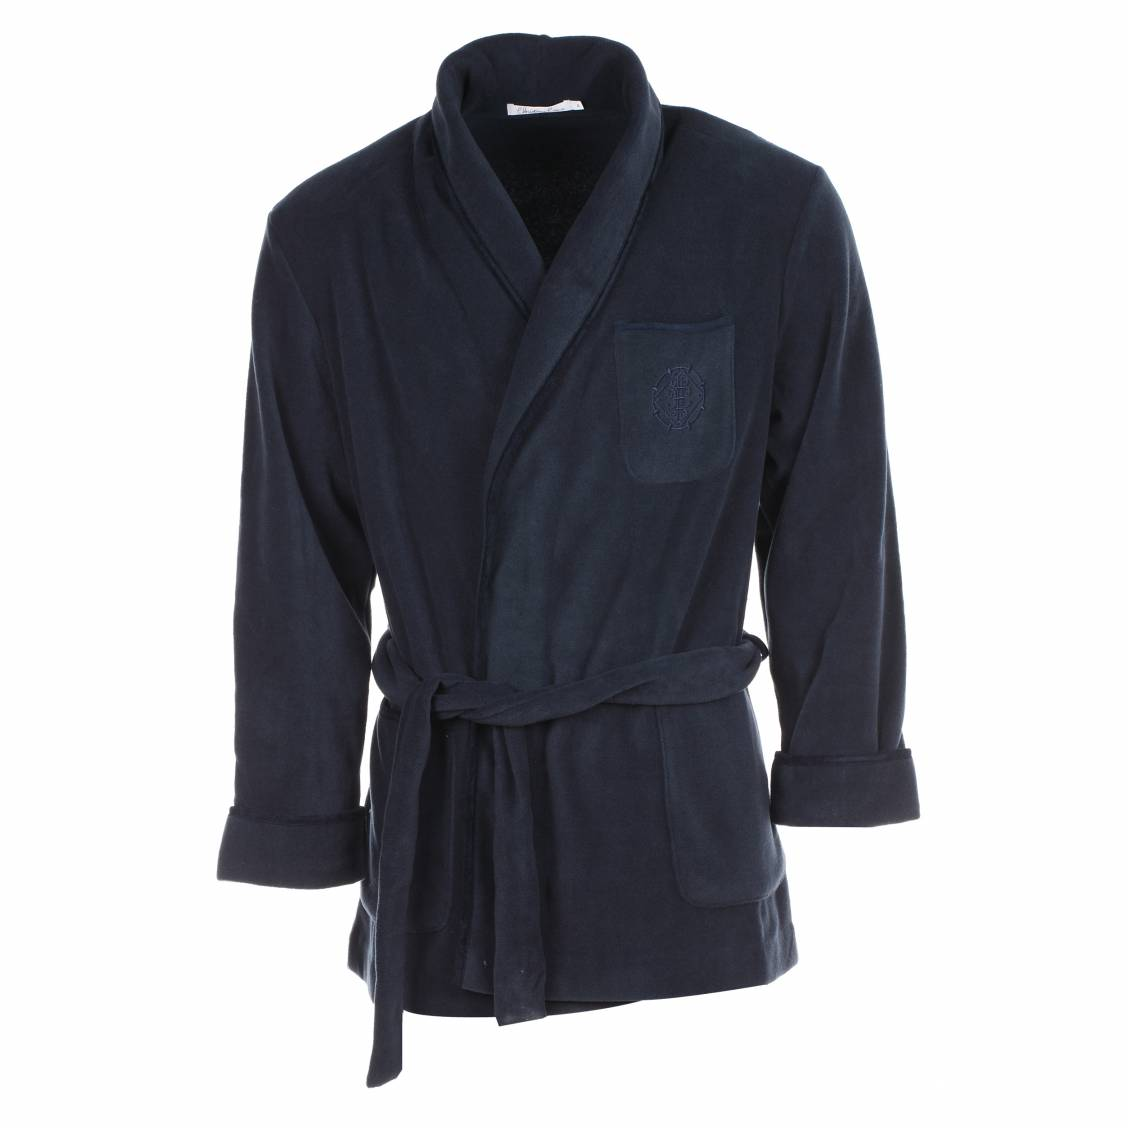 veste d 39 interieur baikal christian cane en polaire bleu marine rue des hommes. Black Bedroom Furniture Sets. Home Design Ideas